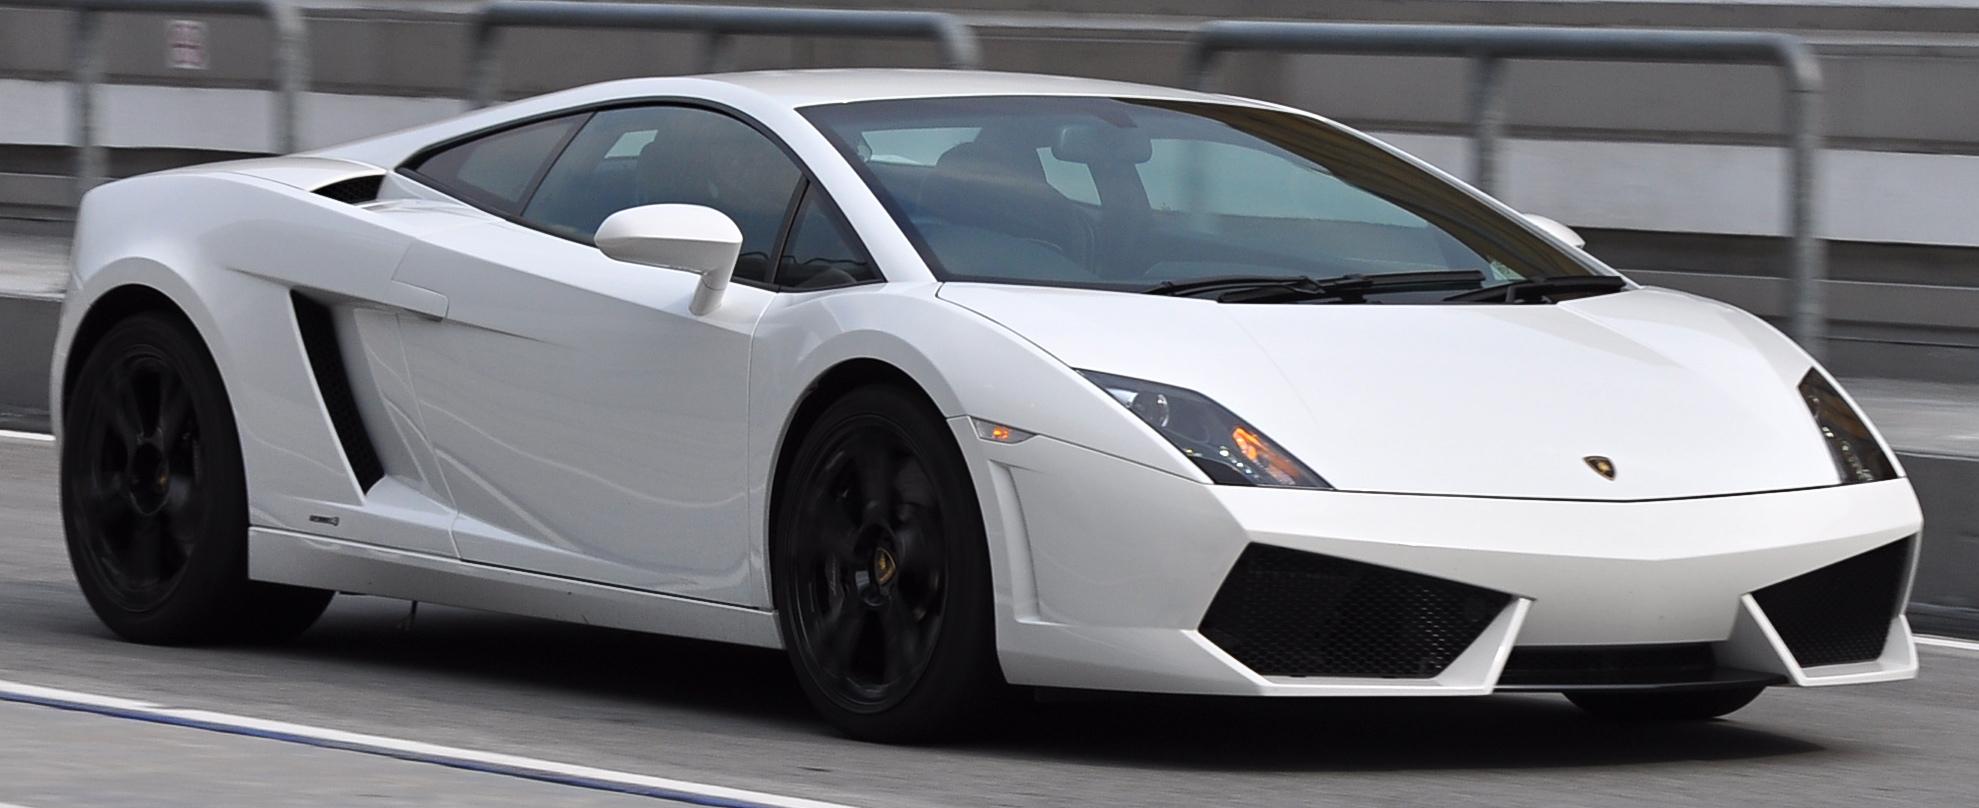 2017 Lambo Gallardo U003eu003e File:Lamborghini Gallardo LP560 4   009